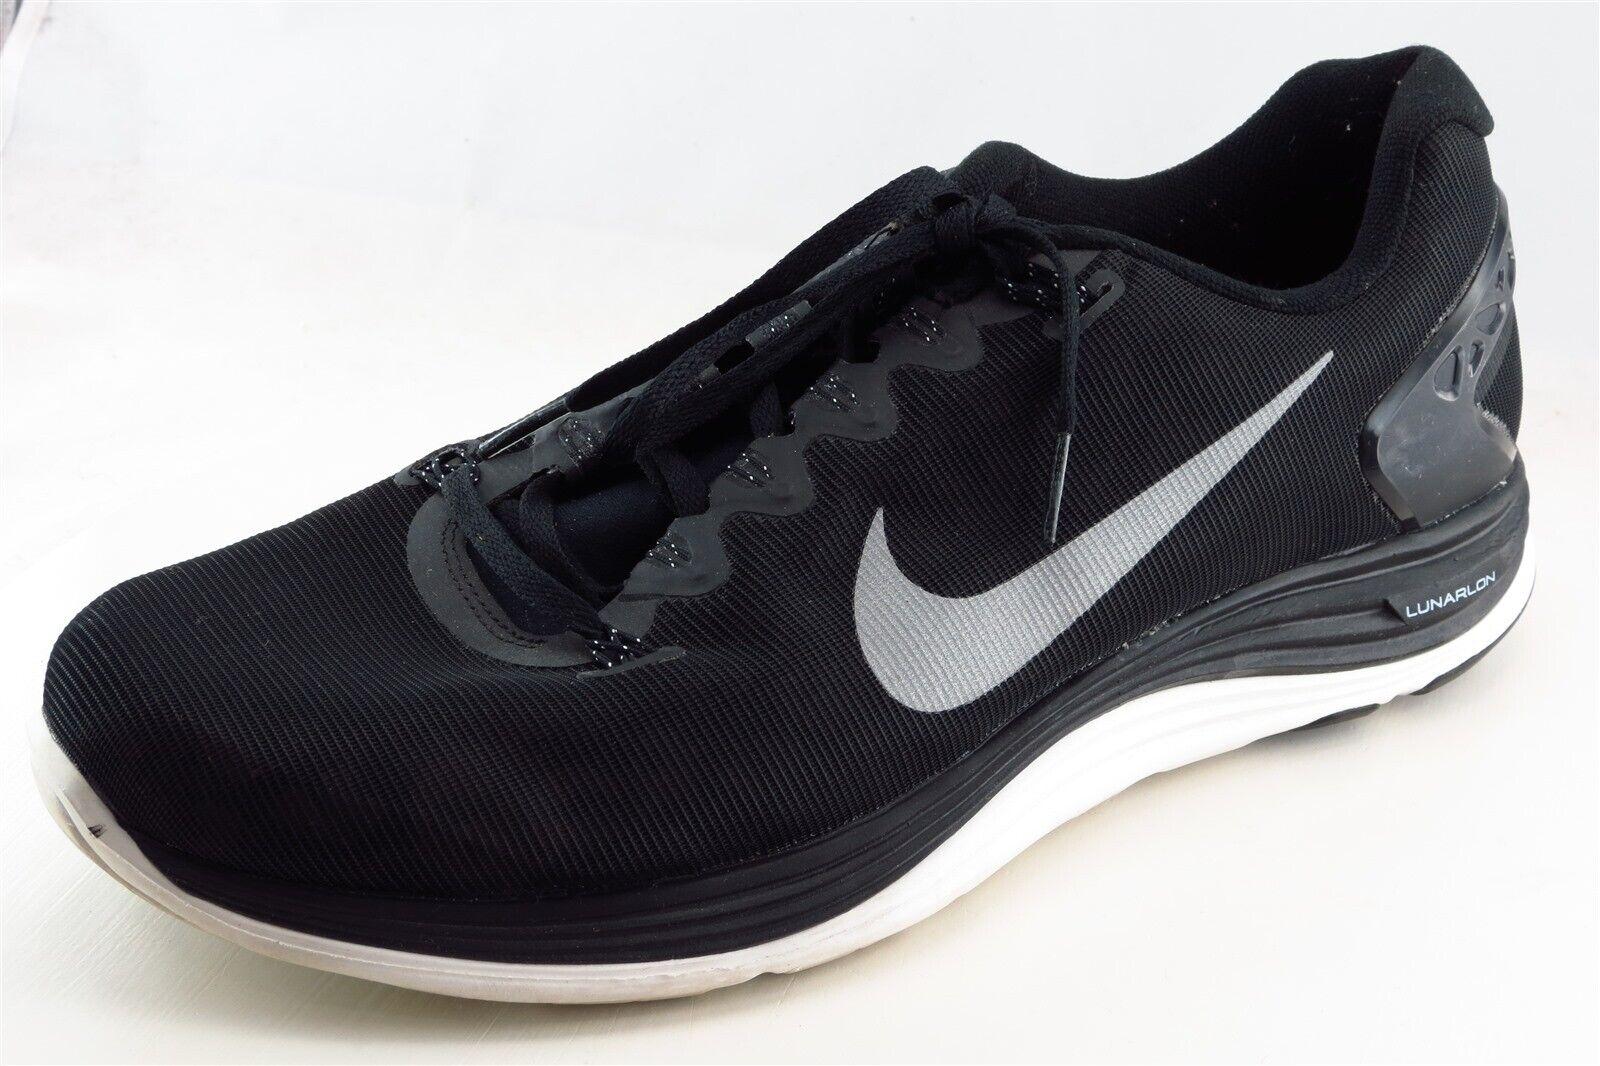 nouveau produit 36bf8 6221f Nike Lunarglide 5 Running Shoes Black Fabric Men 12 Medium (D, M)